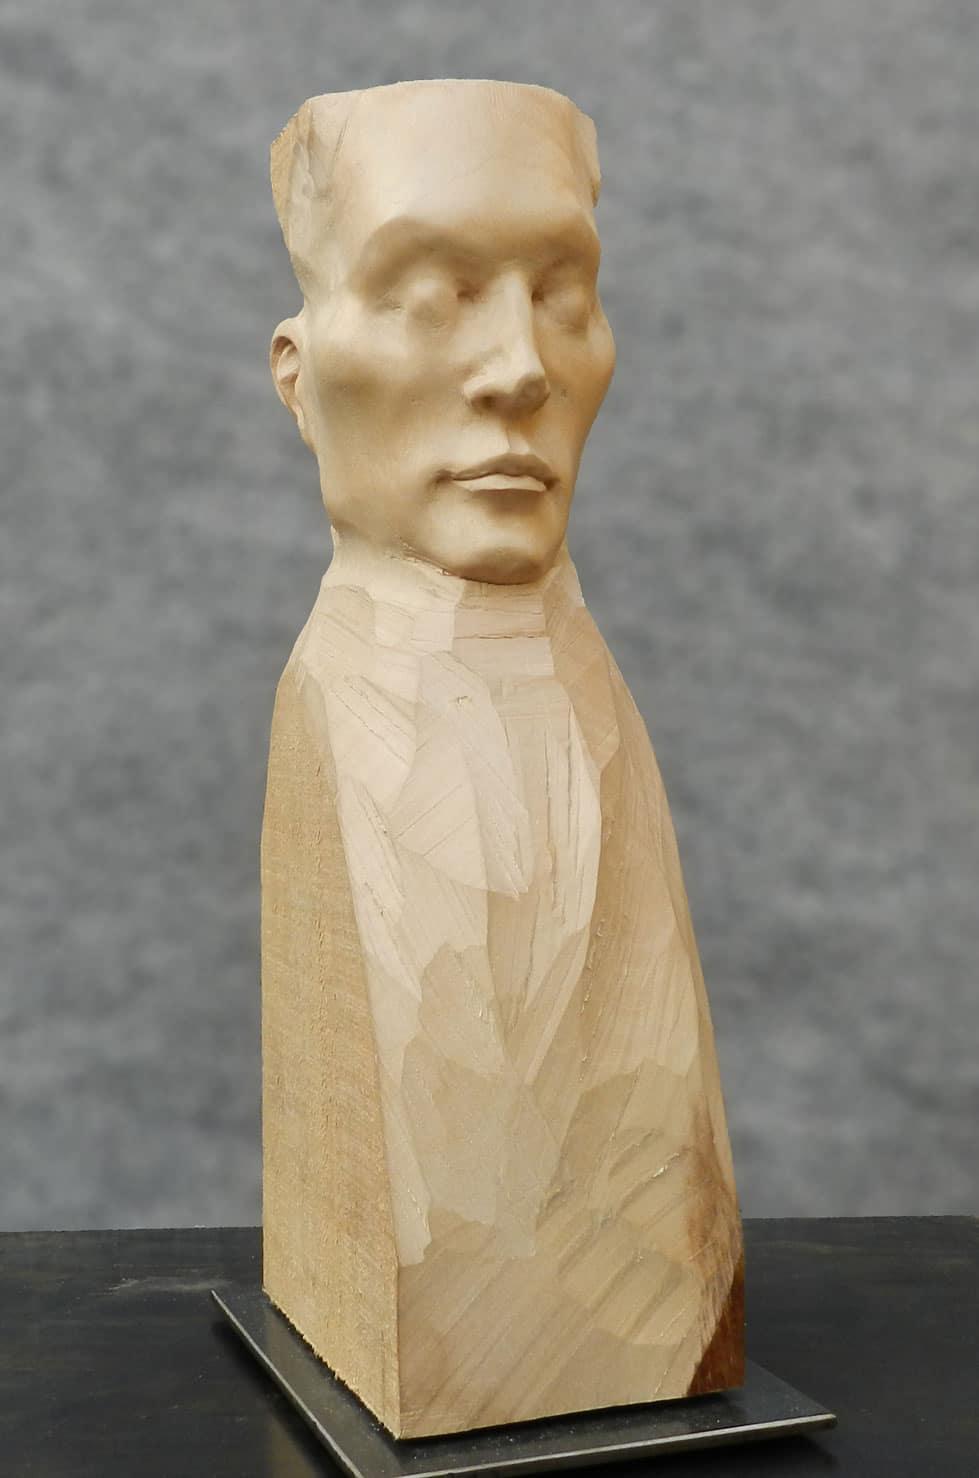 """ Silence "", tilleul, 36 cm, 2012"